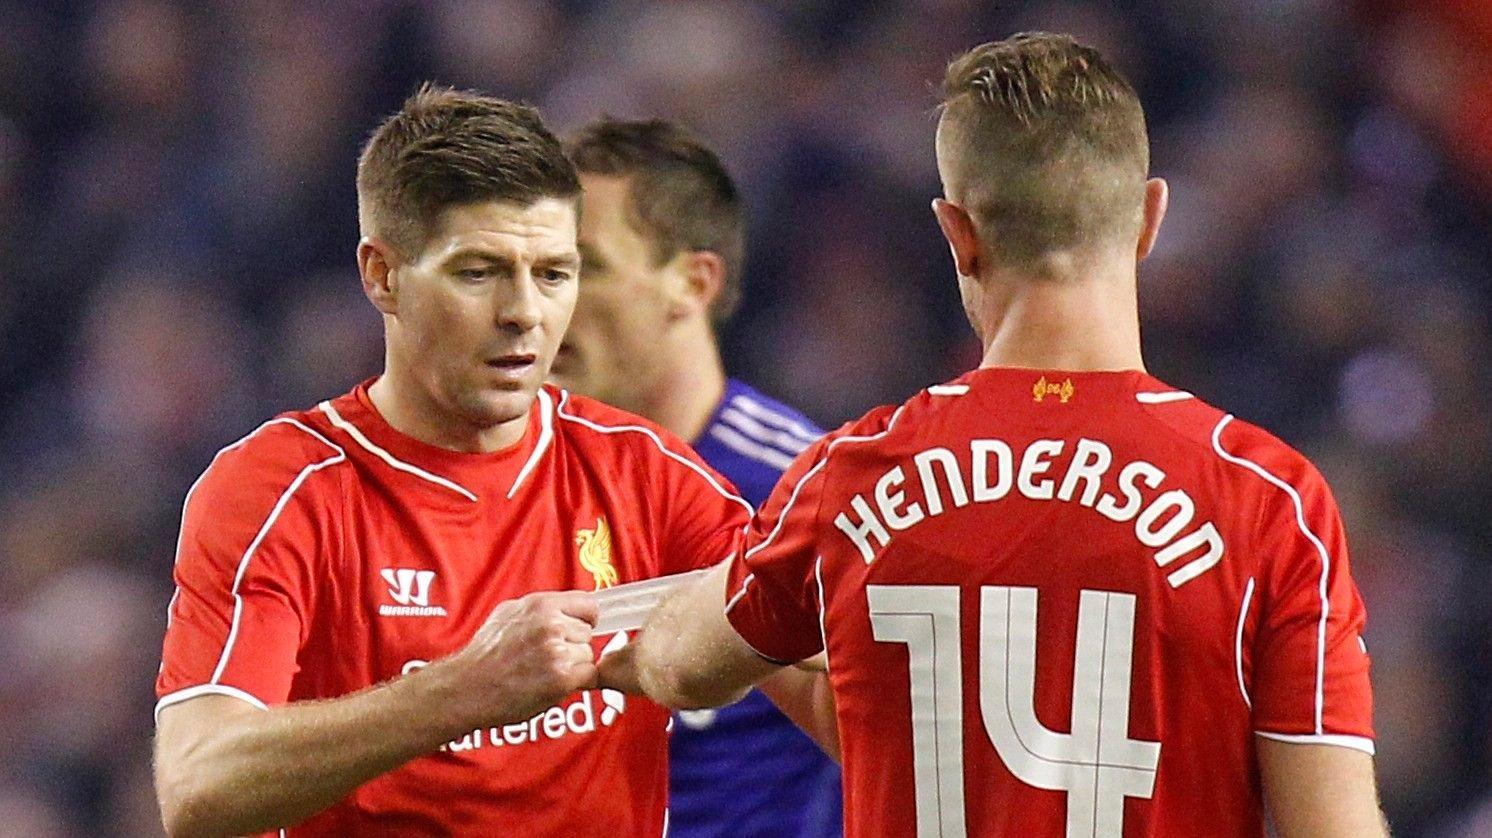 ARVTAKER: Jordan Henderson tok over kapteinsbindet i Liverpool da Steven Gerrard forlot klubben.